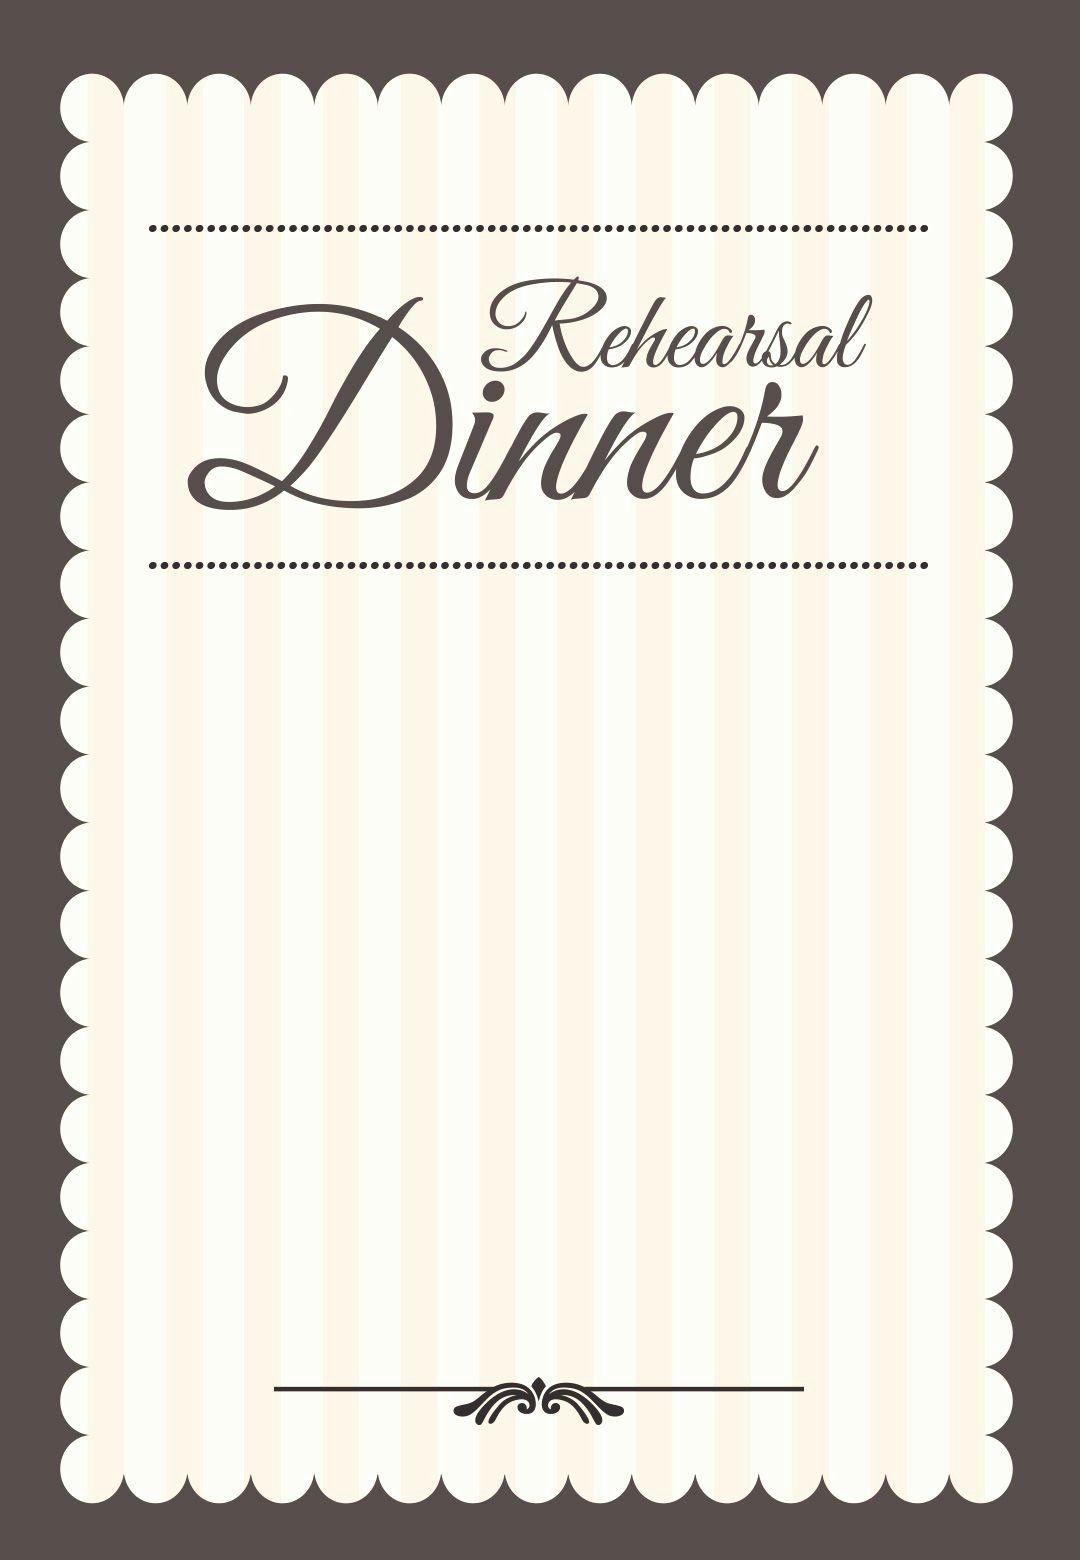 006 Singular Free Dinner Invitation Template High Resolution  Templates Rehearsal Printable Italian ThanksgivingFull